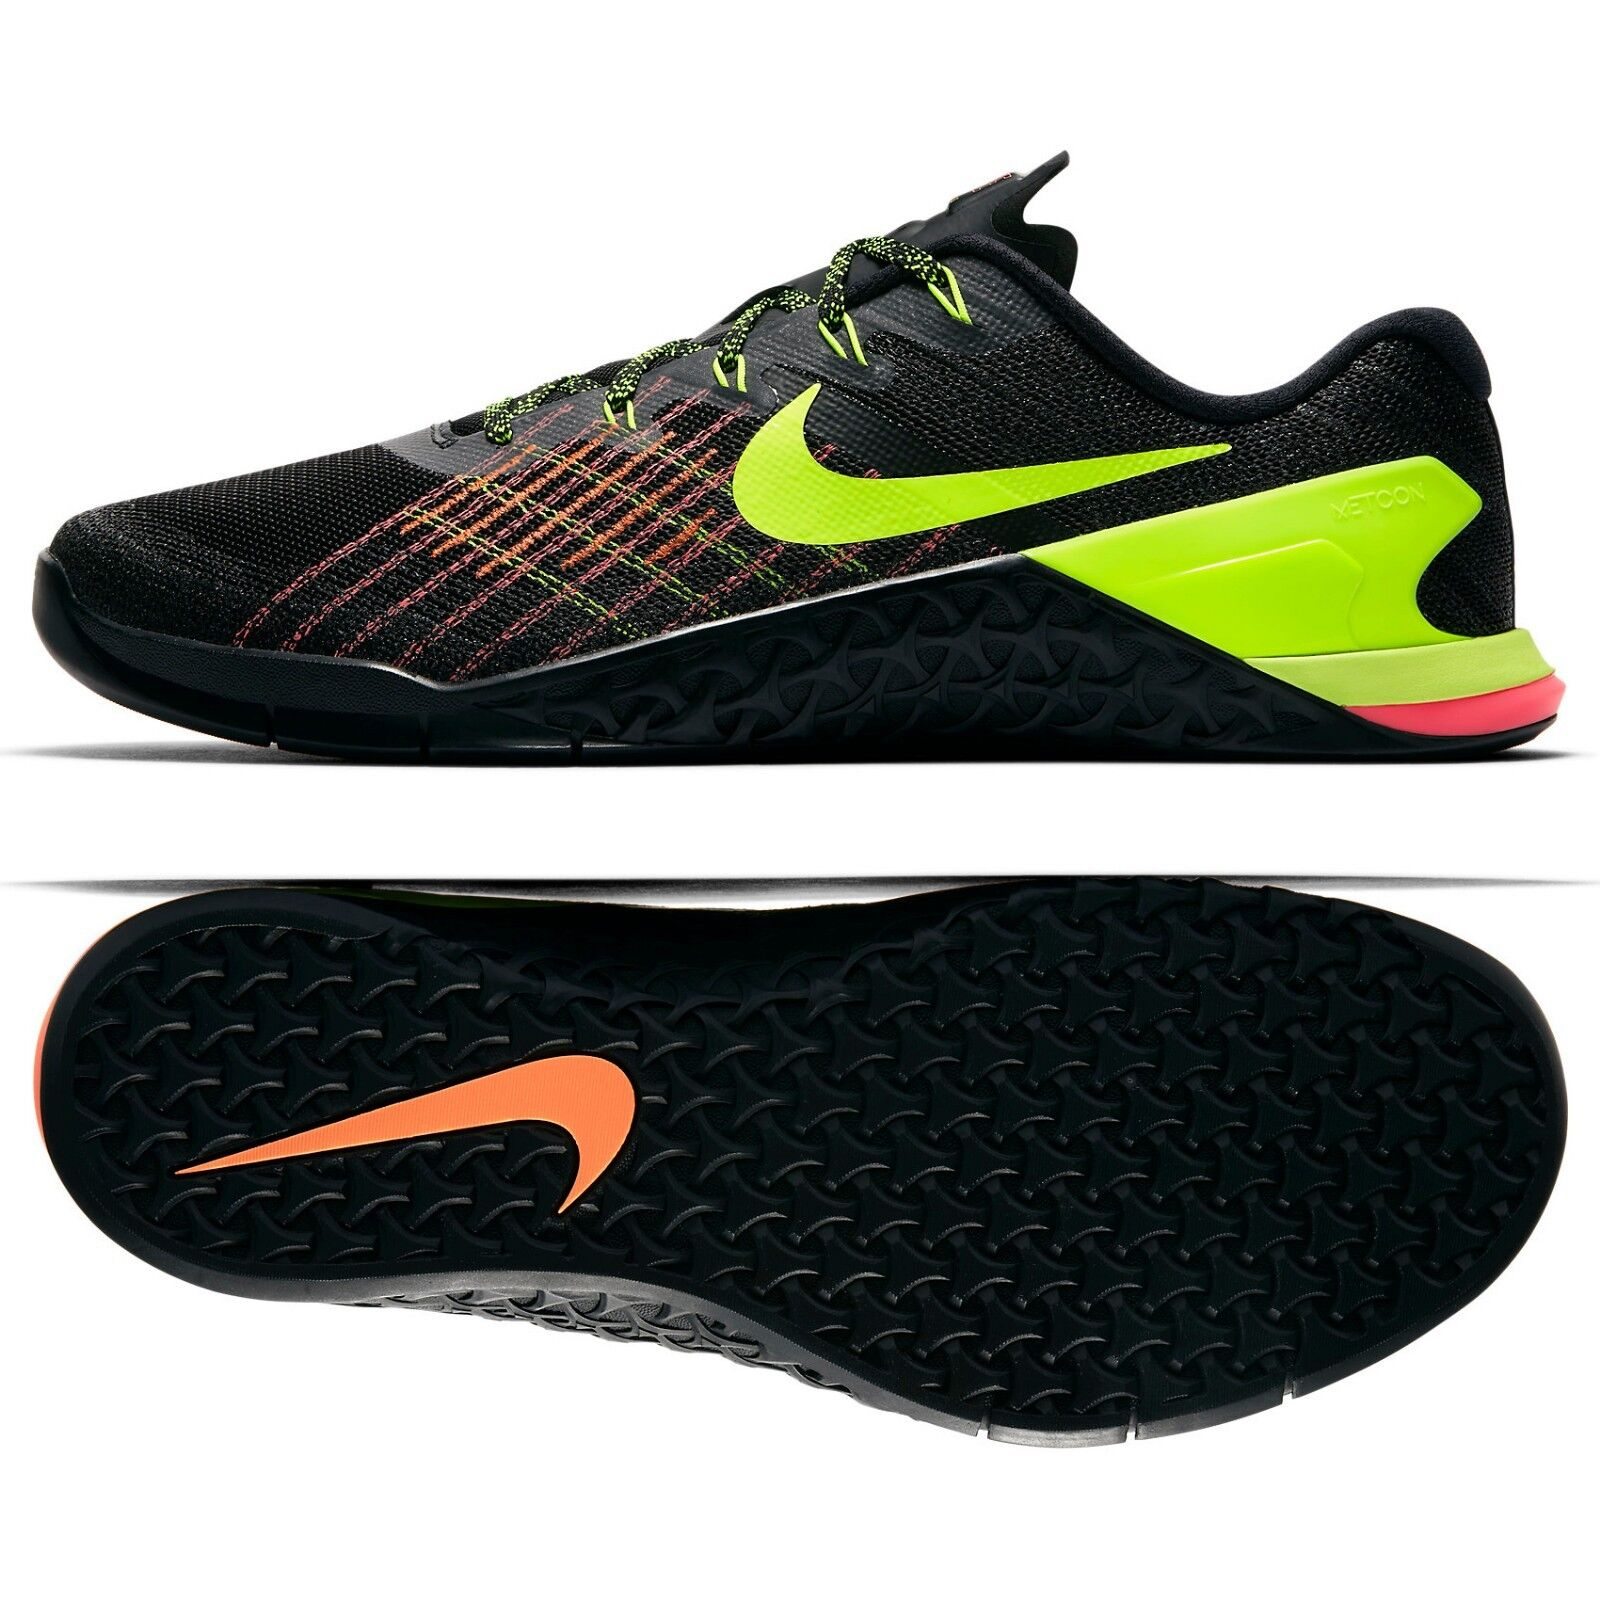 Nike Metcon 3 Black/Hyper Crimson/Hot Punch/Volt 852928-012 Men's Training Shoes